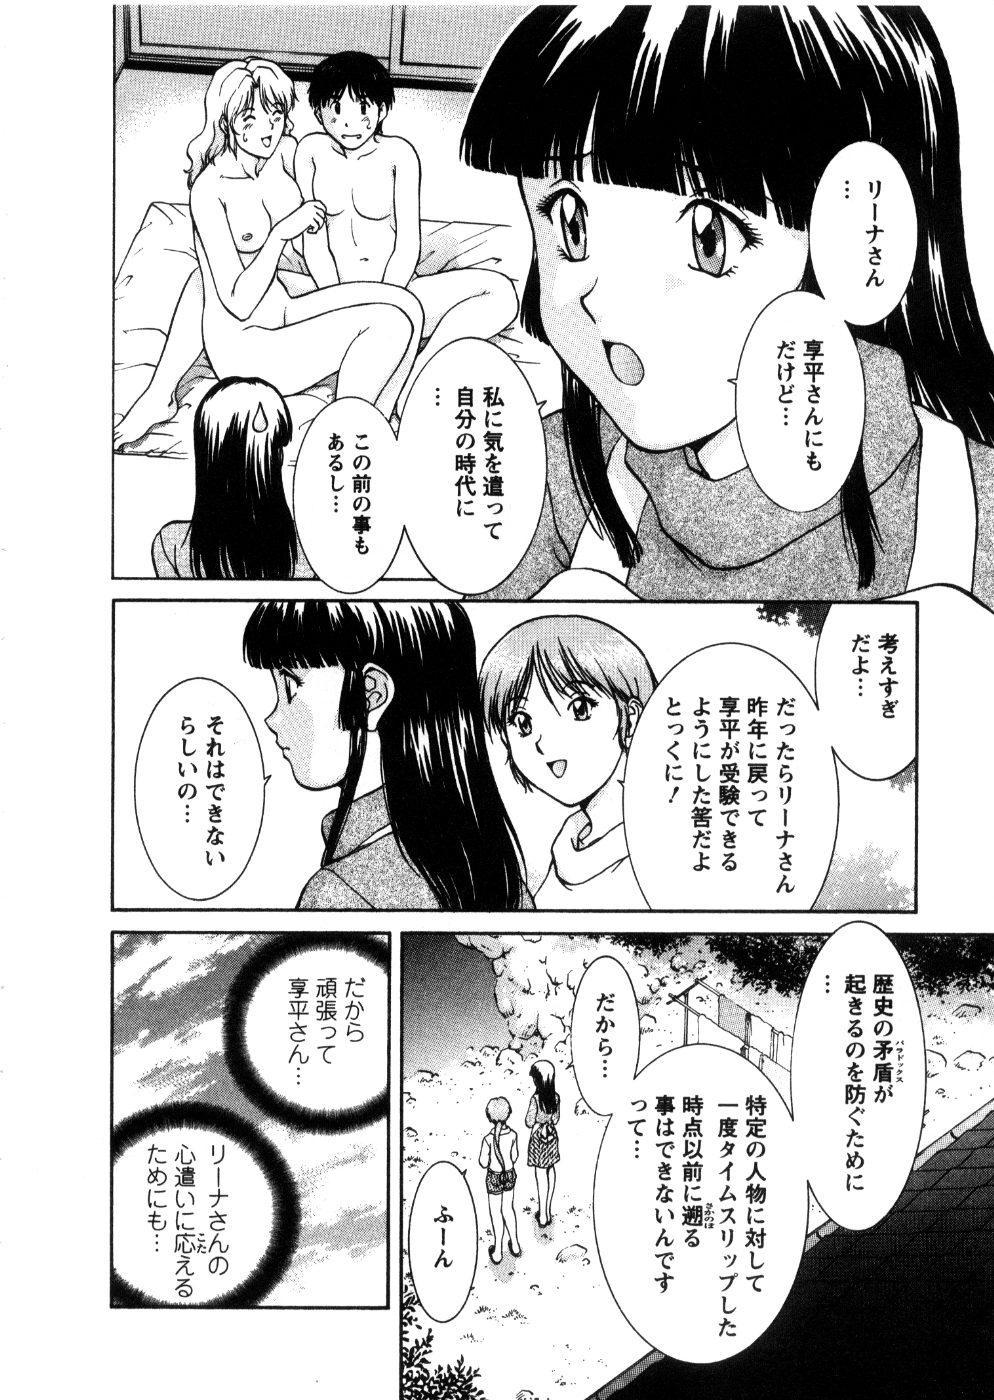 Oneechan-tachi ga Yatte Kuru 03 115